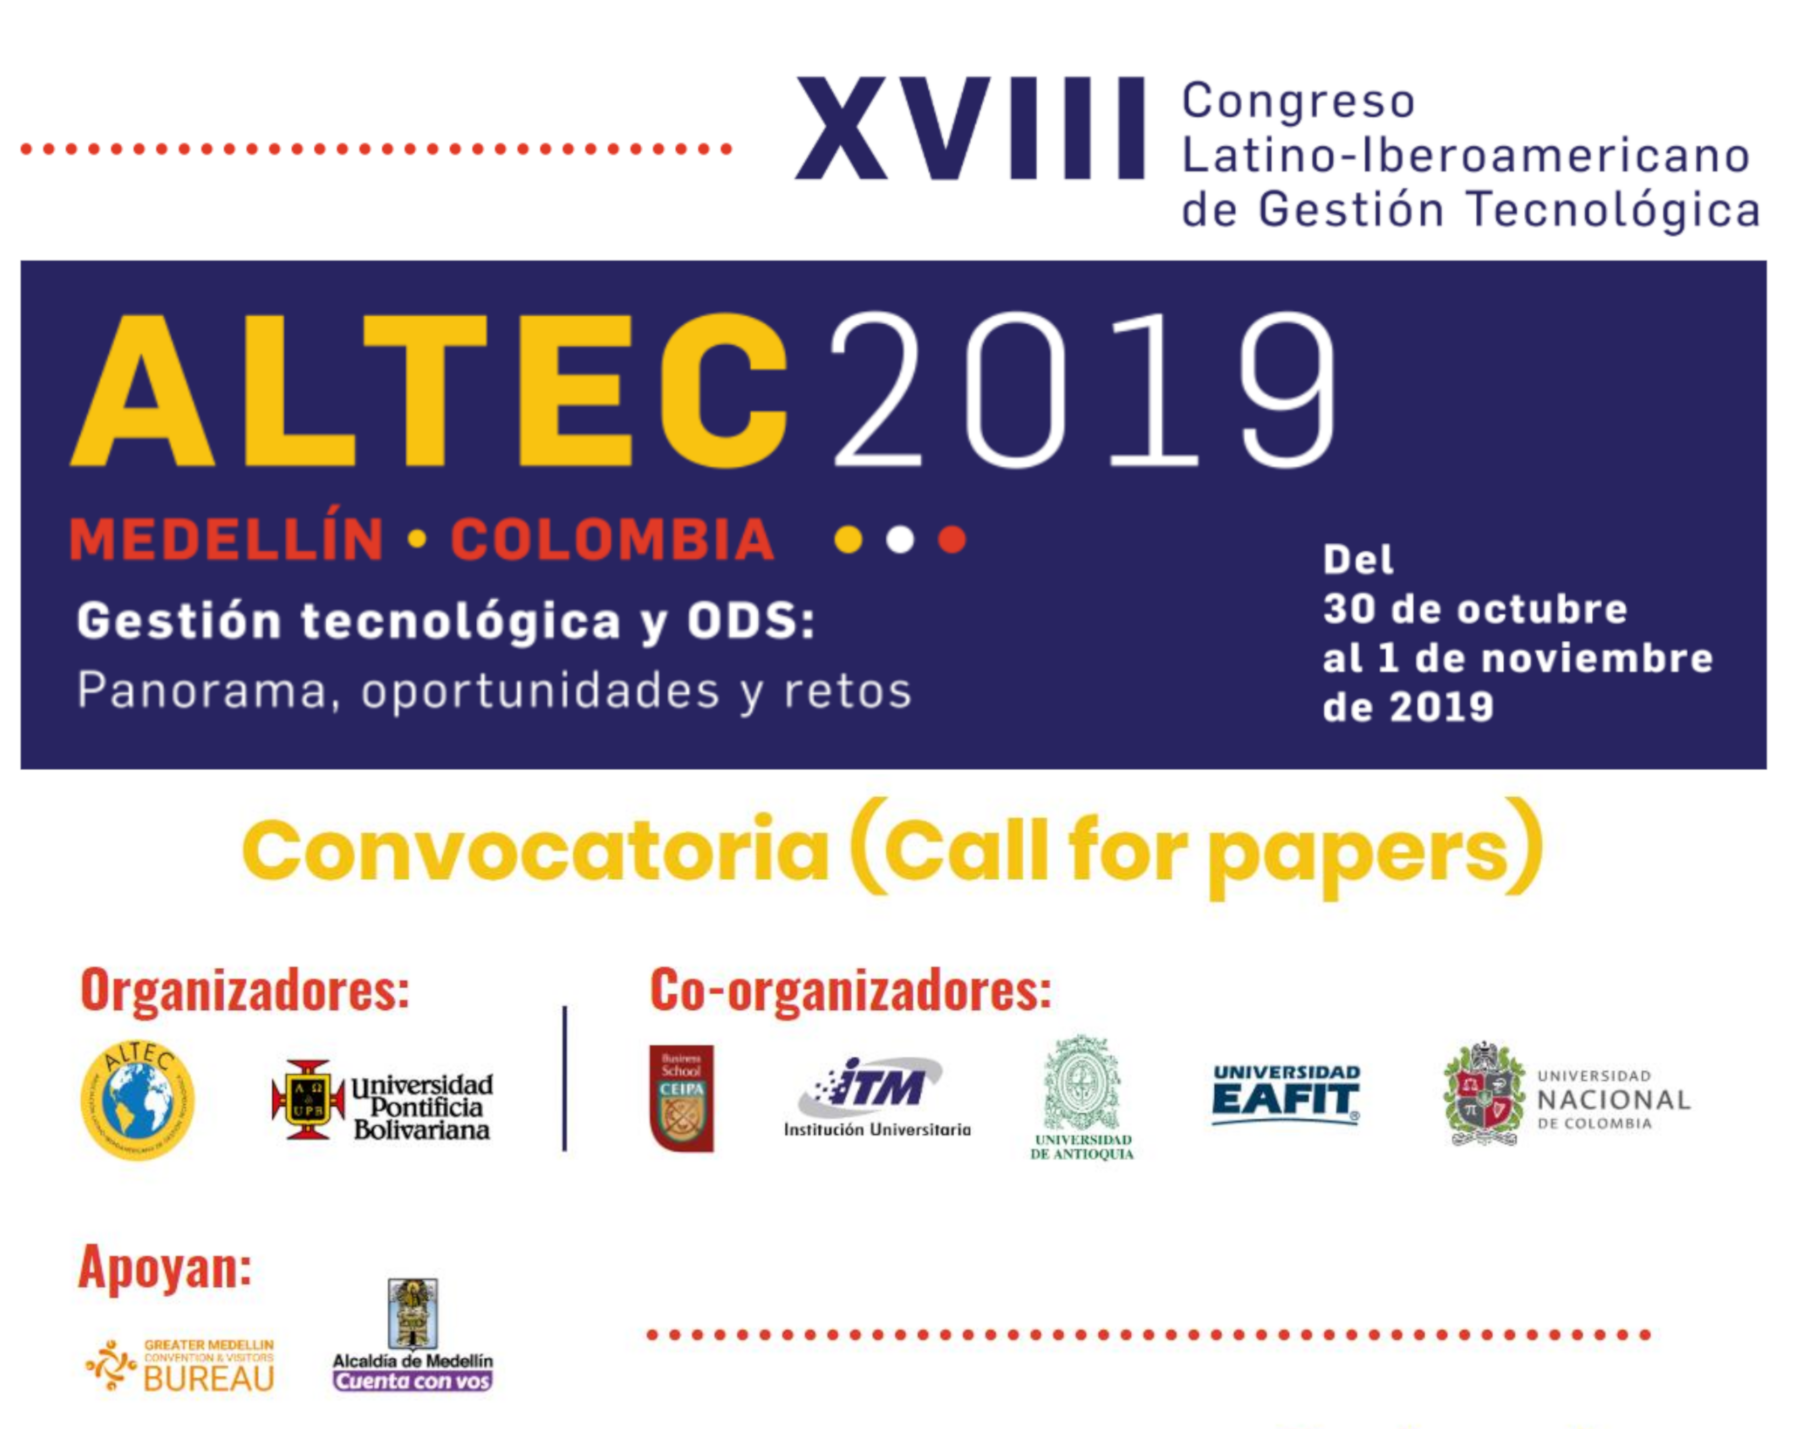 XVIII Congreso Latino-Iberoamericano de Gestión Tecnológica (ALTEC 2019)